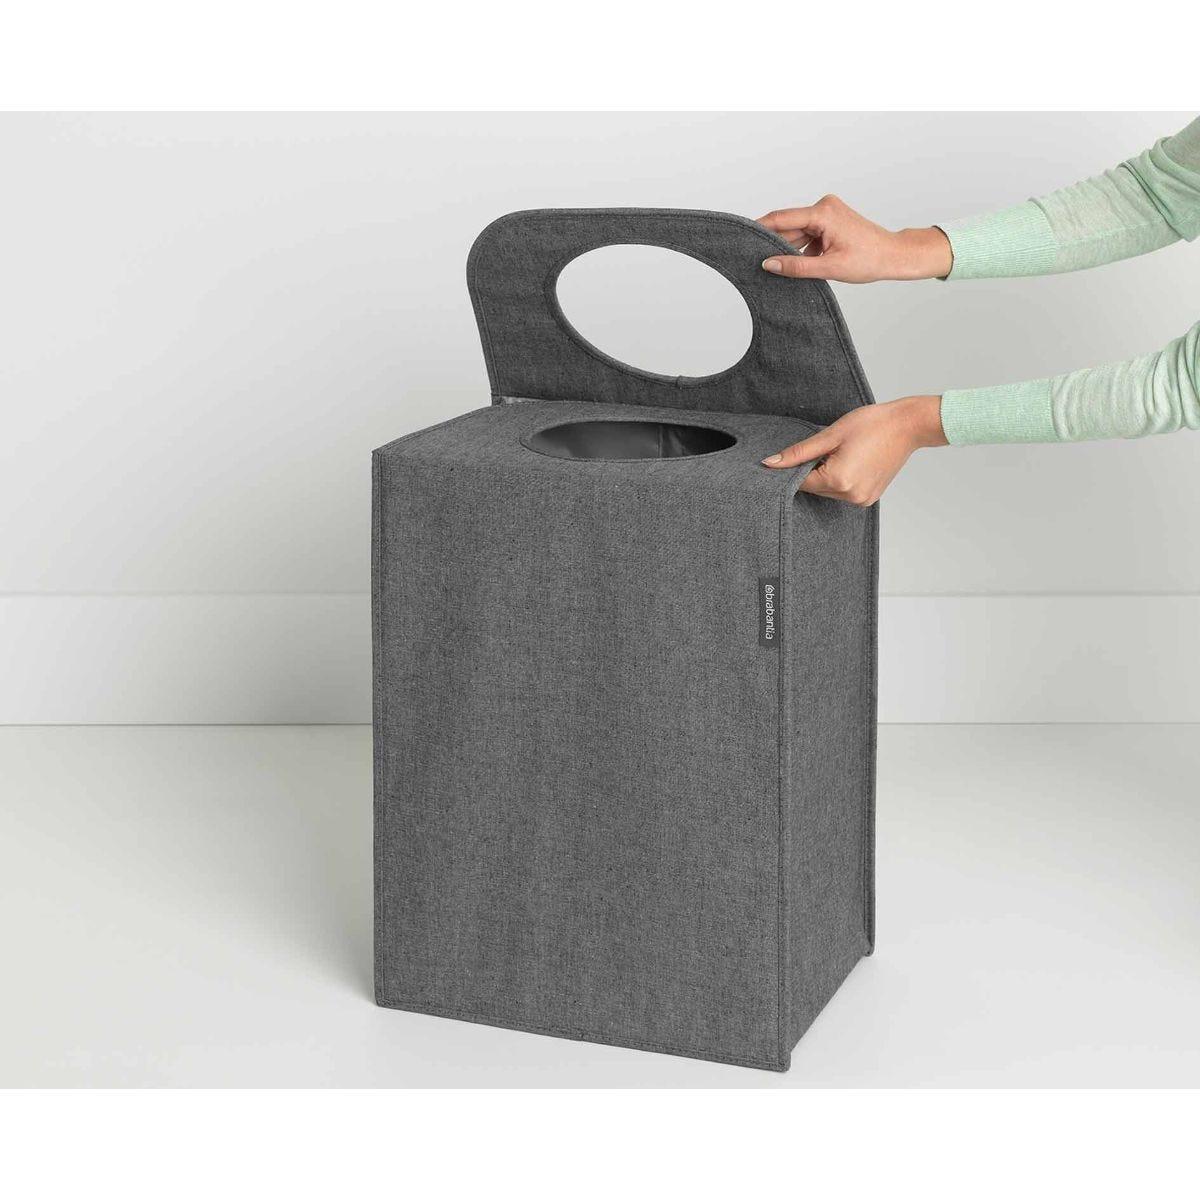 Brabantia Rectangular Laundry Bag 55 Litre, Charcoal